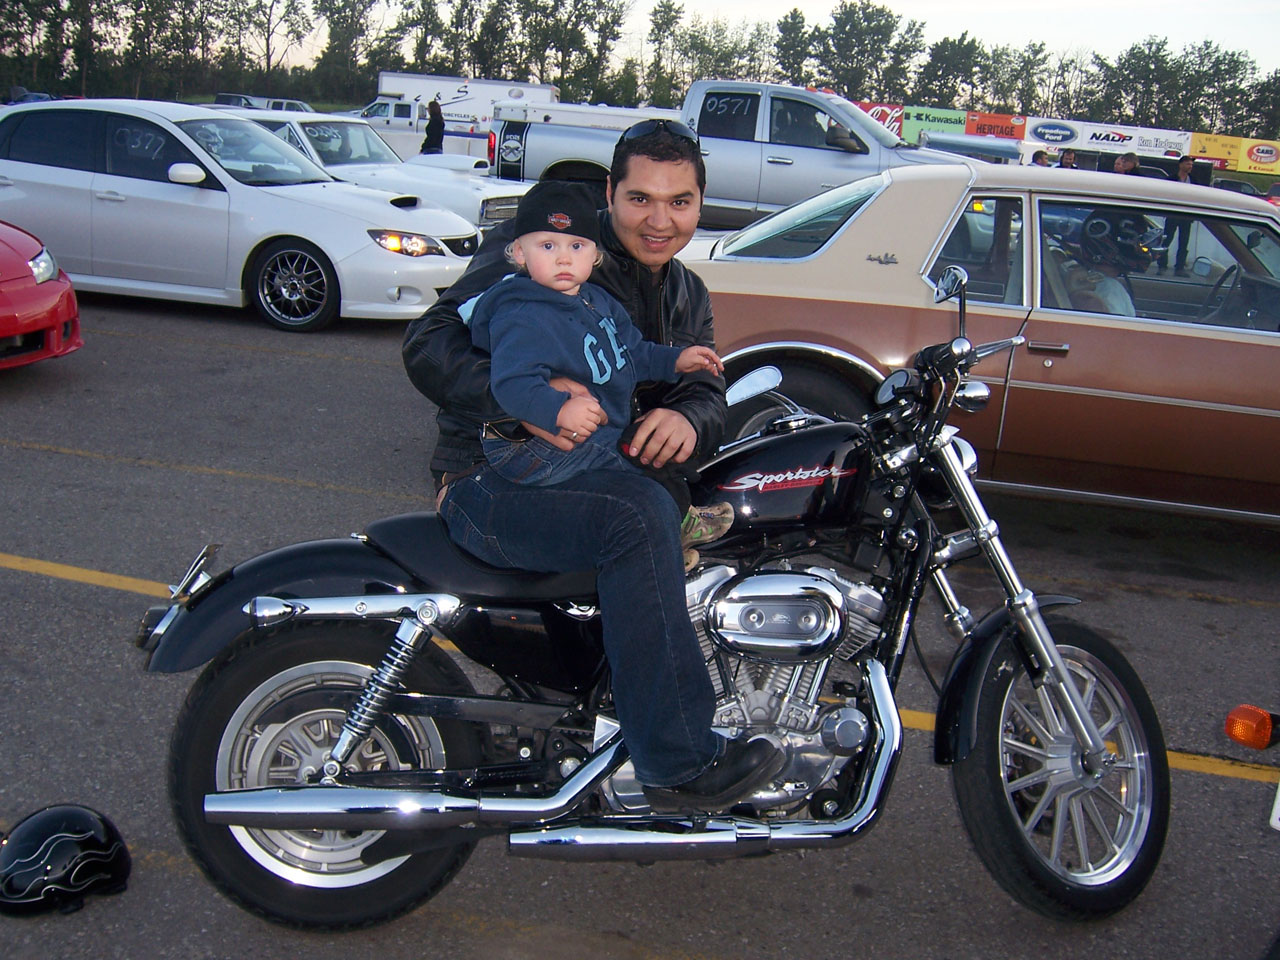 Harley Davidson Sportster Xlc Specs